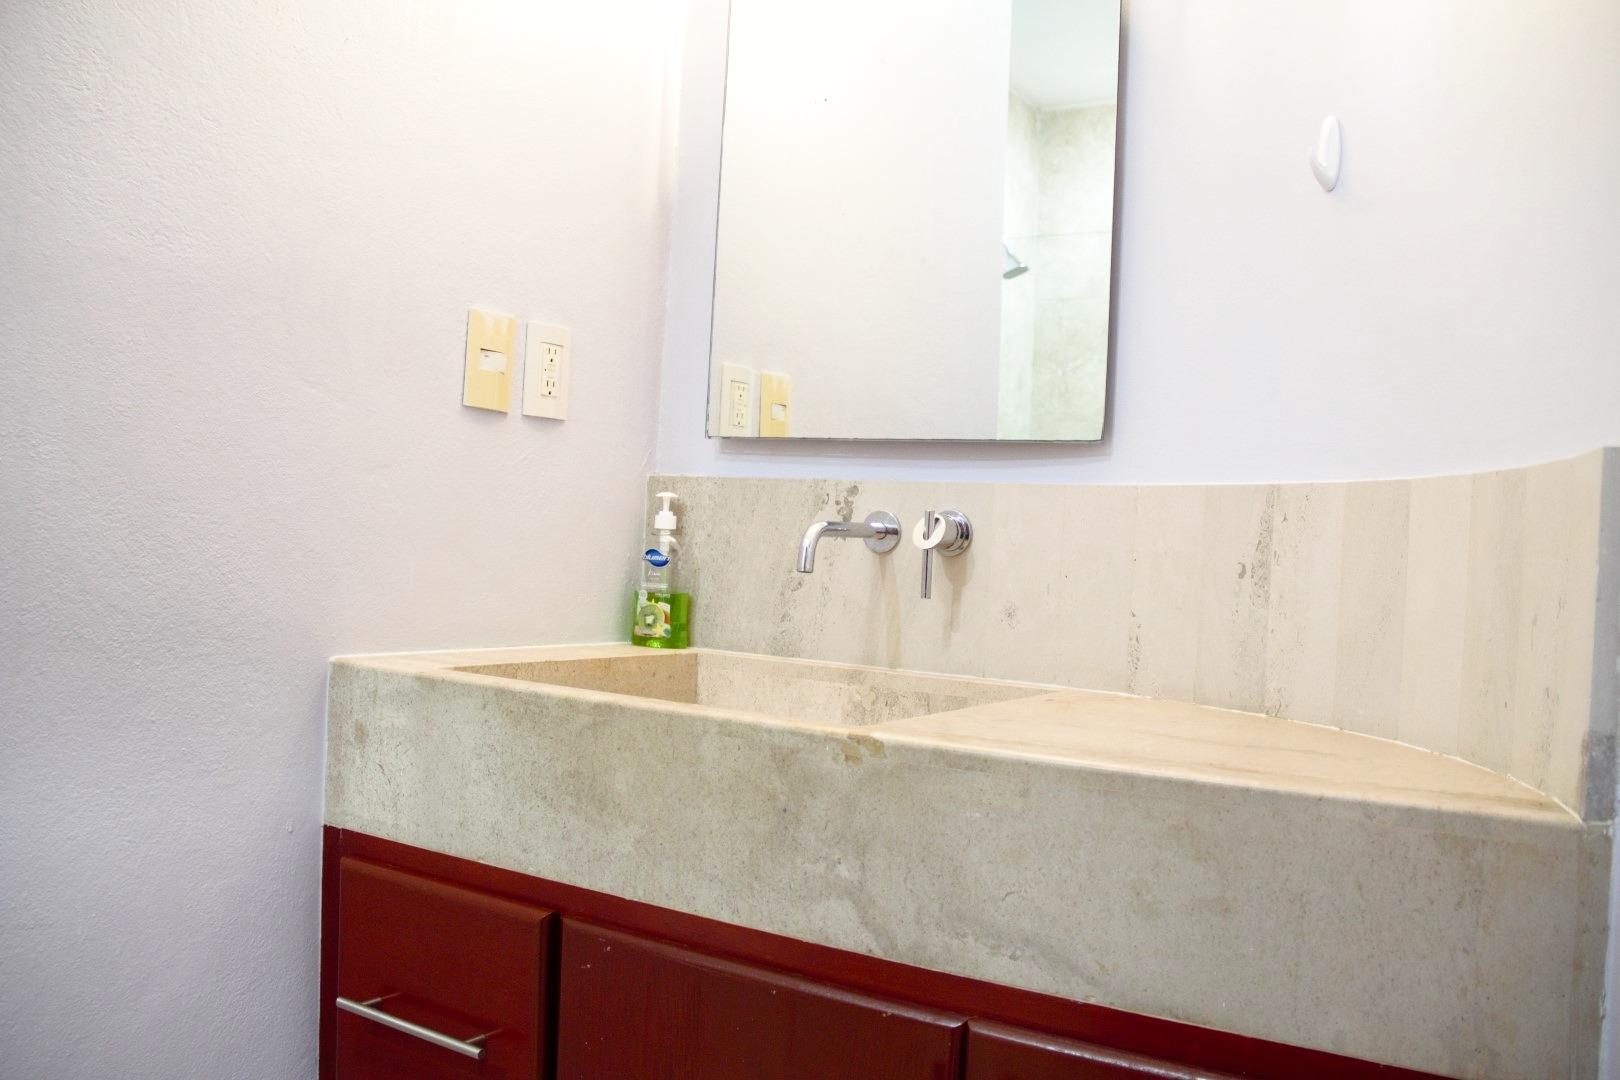 Vanity in shared third bathroom.